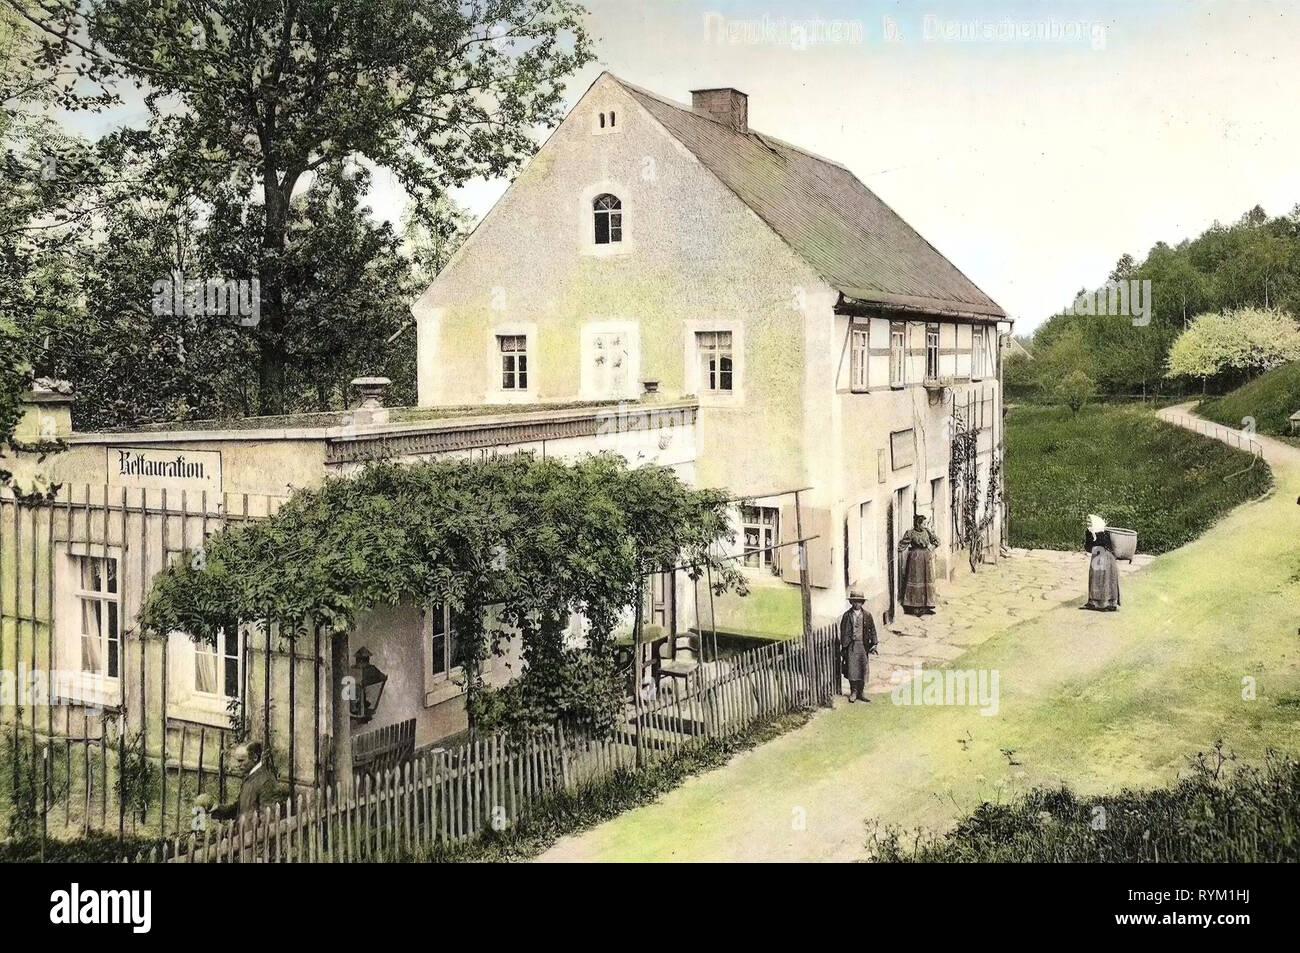 Neukirchen (Reinsberg), Restaurants in Landkreis Meißen, 1906, Landkreis Meißen, Neukirchen, Restauration, Germany - Stock Image